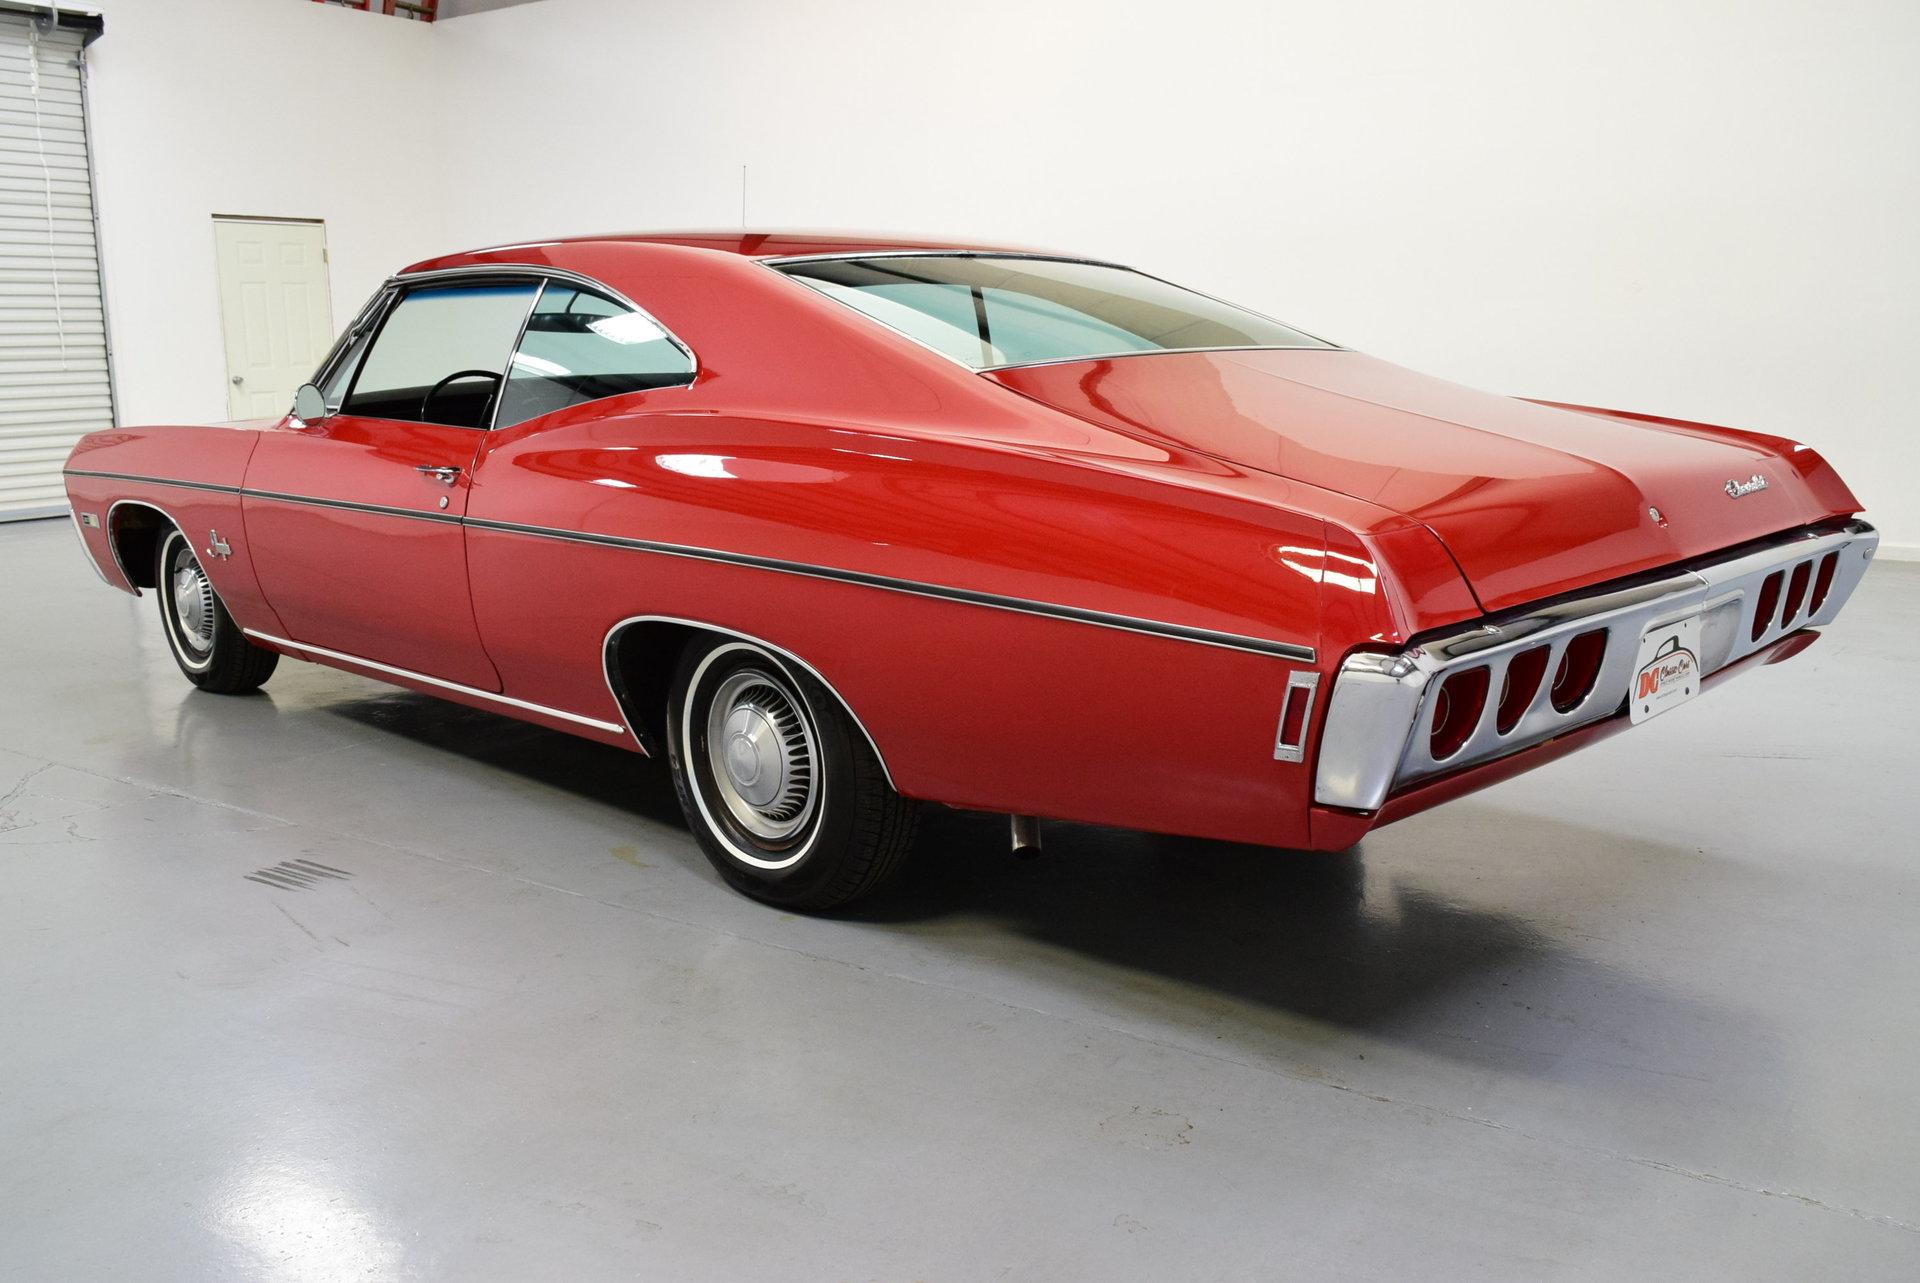 1968 Chevrolet Impala Shelton Classics Performance 2 Door